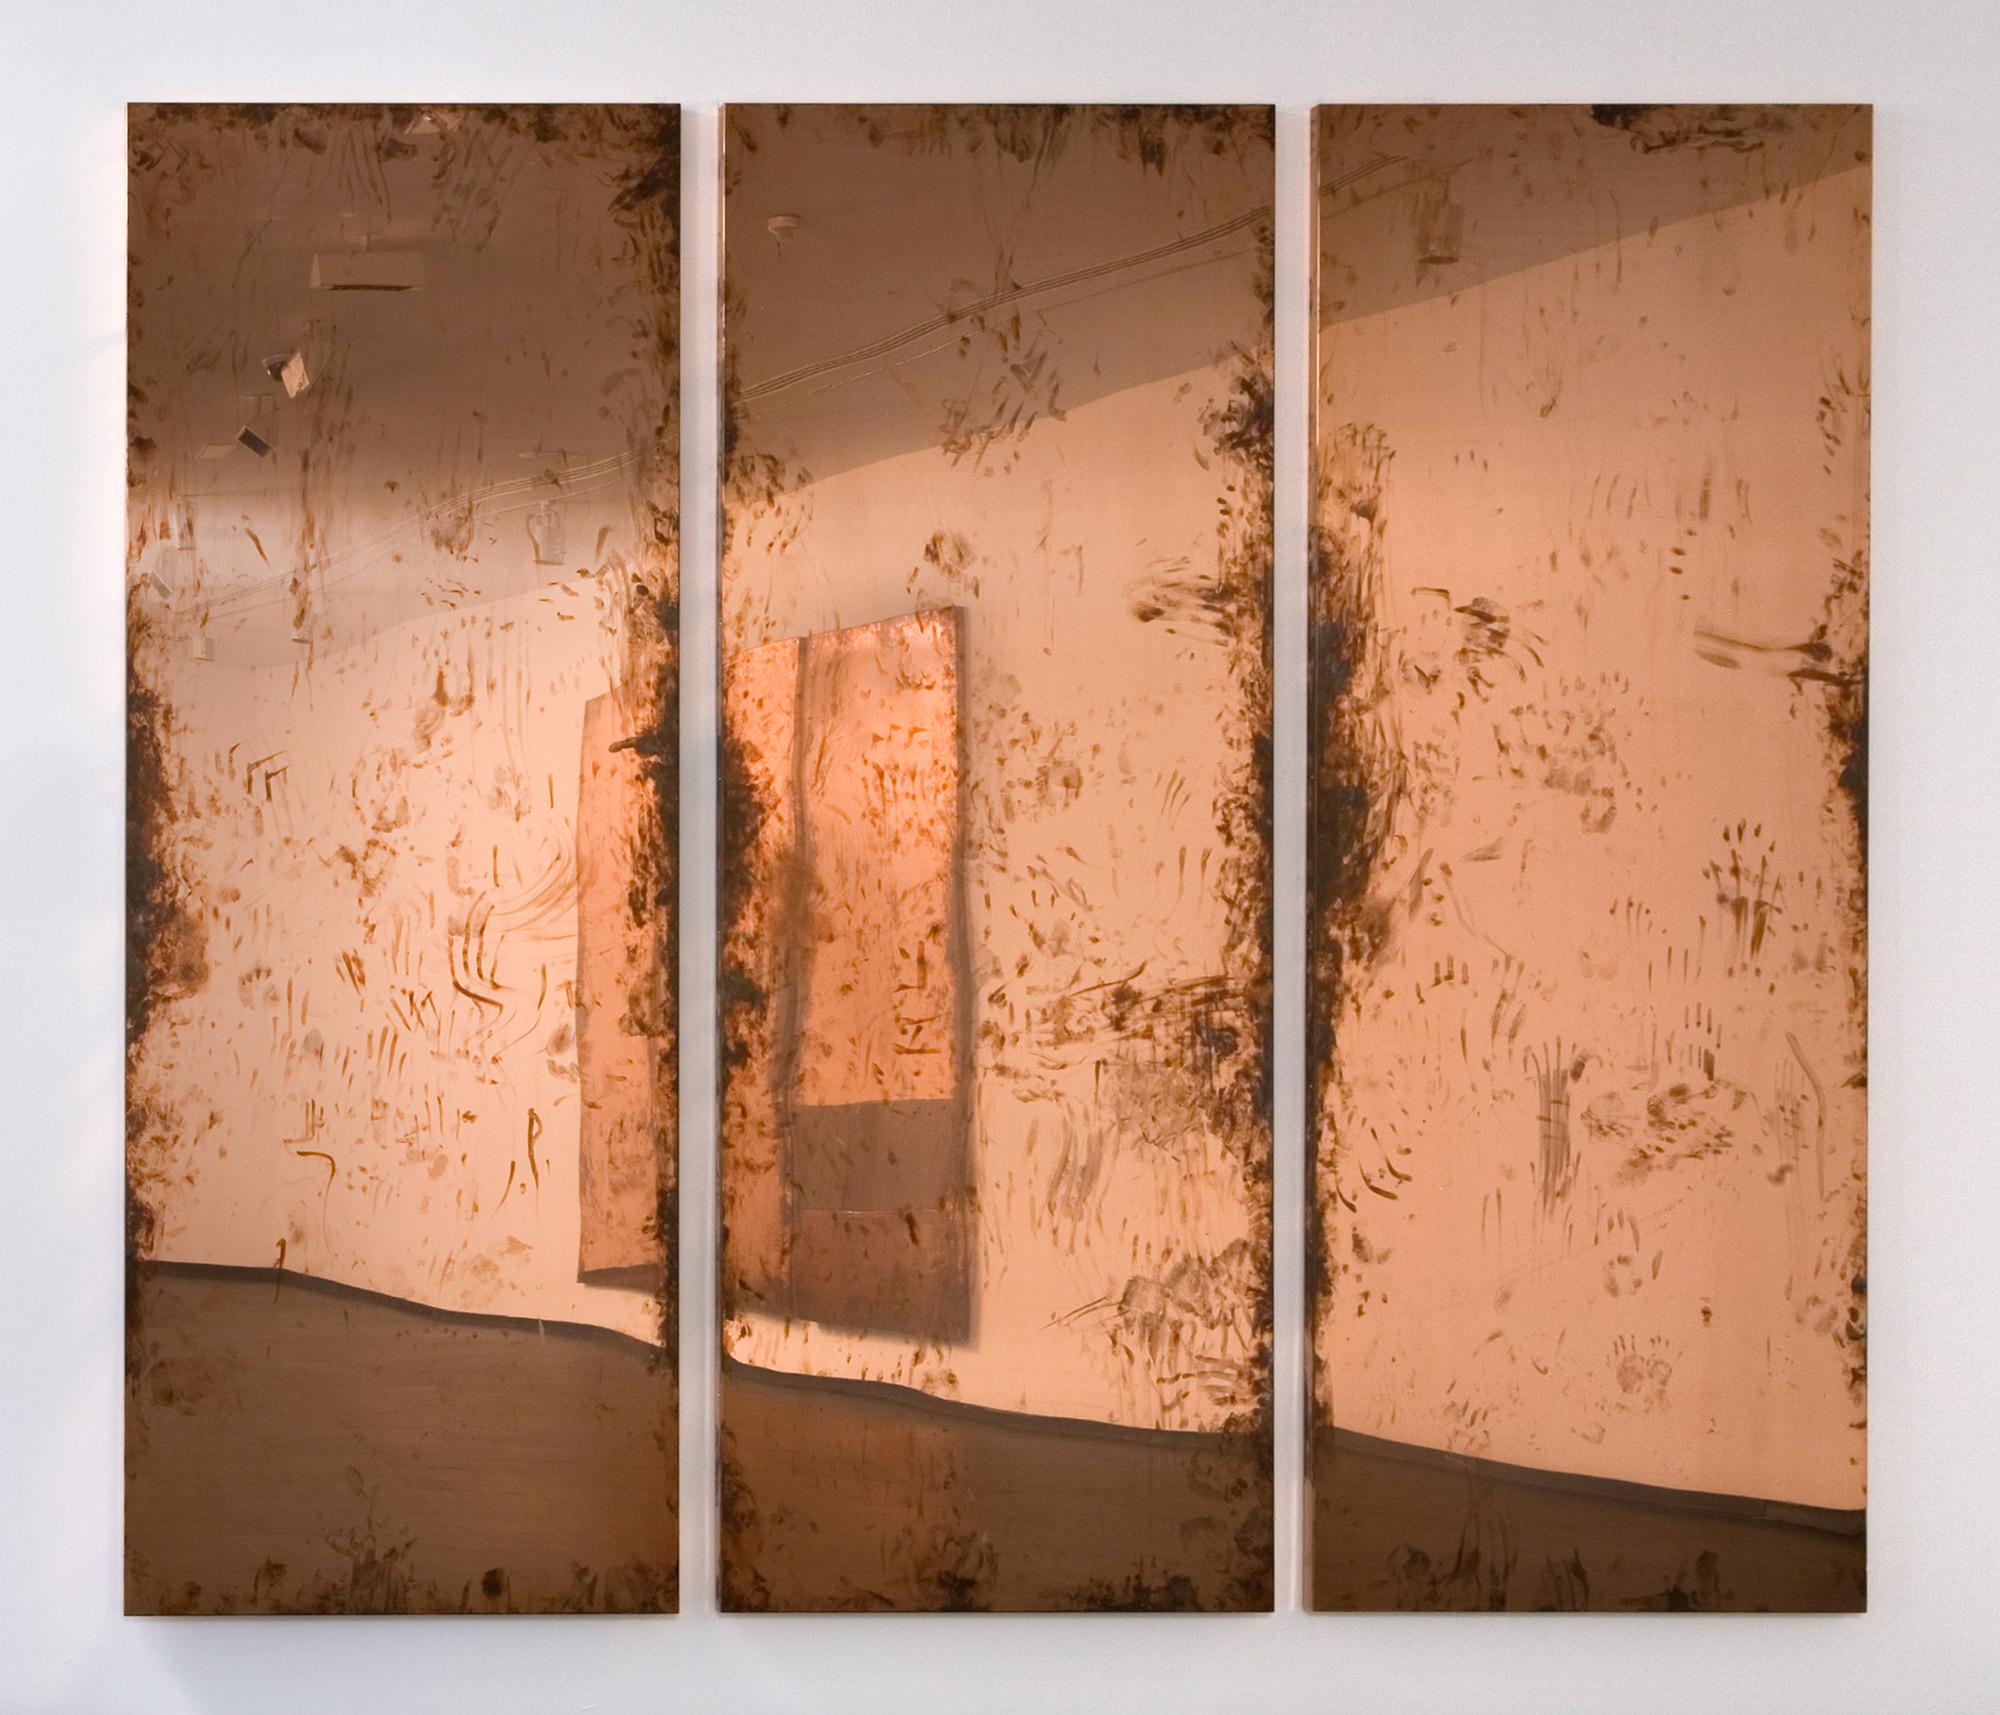 Copper Surrogate (February 10–17/ May 2–6 2011, Malmo, Sweden; June 13–20/ October 31–November 4, 2011, Madrid, Spain; June 8/18, 2012, Basel, Switzerland; October 22, 2015, Beirut Lebanon)    2011–   Polished copper  116 x 45 3/4 x 2 inches, each, 9 parts   Surrogates (Full Sheet, Art Handling), 2011–